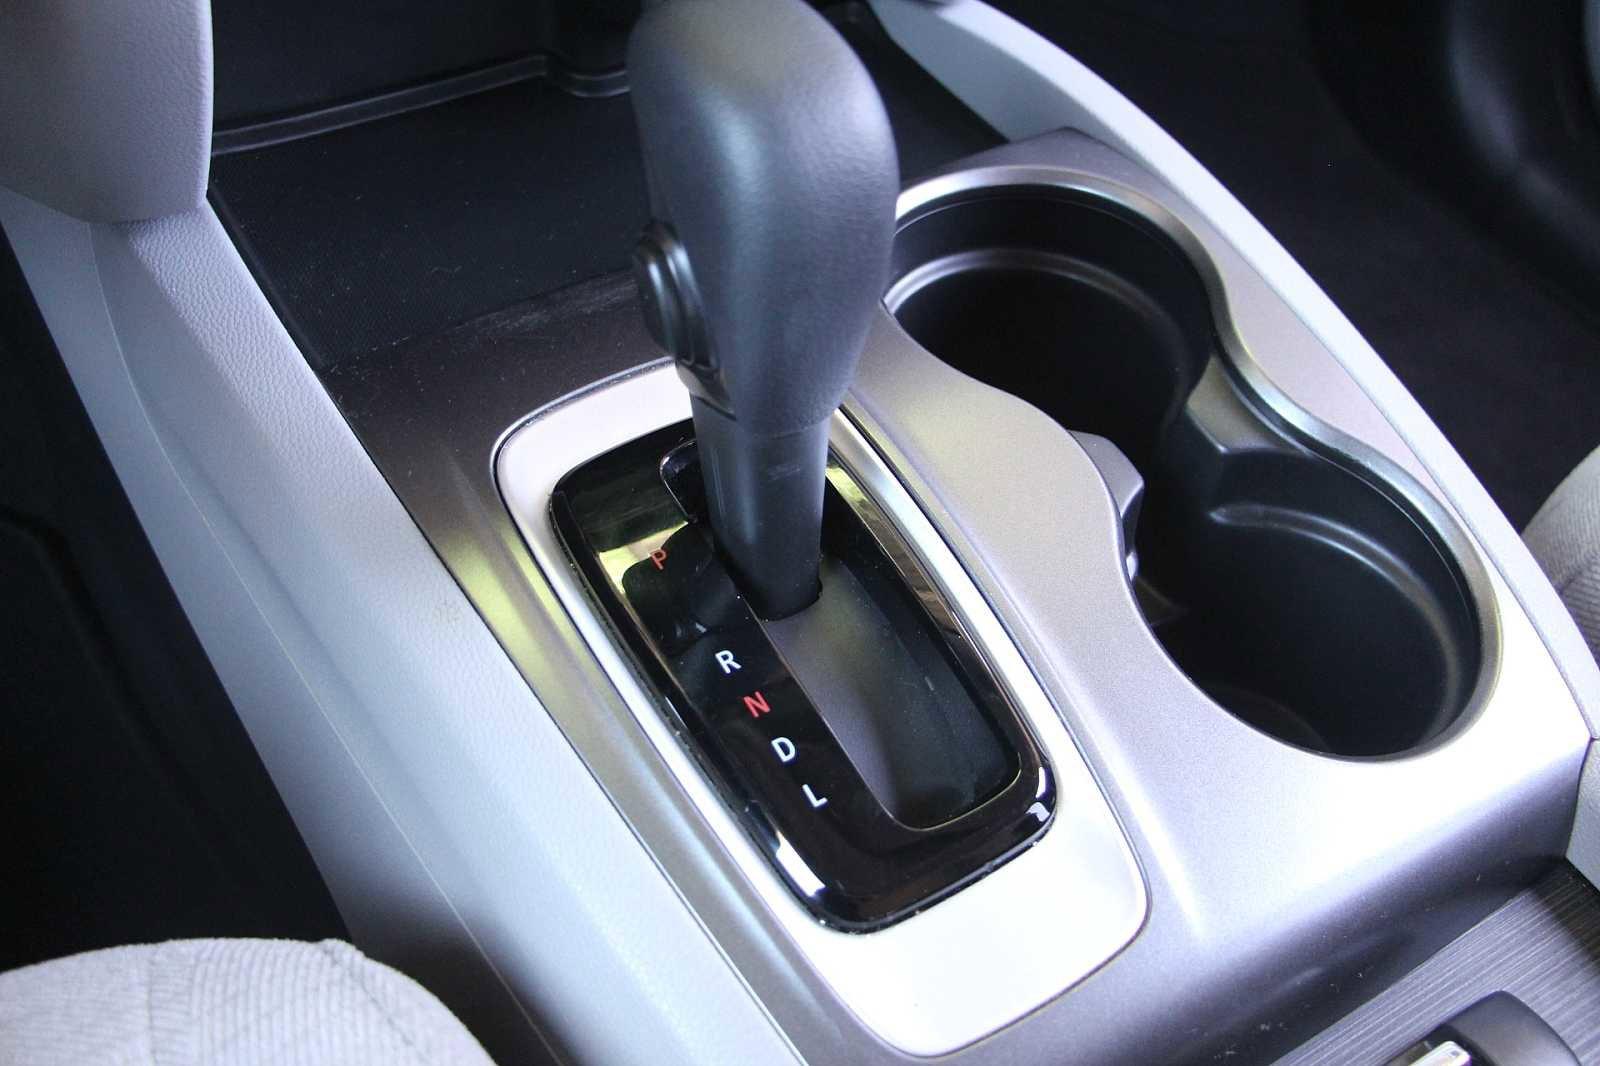 Pre-Owned 2018 Honda Pilot LX